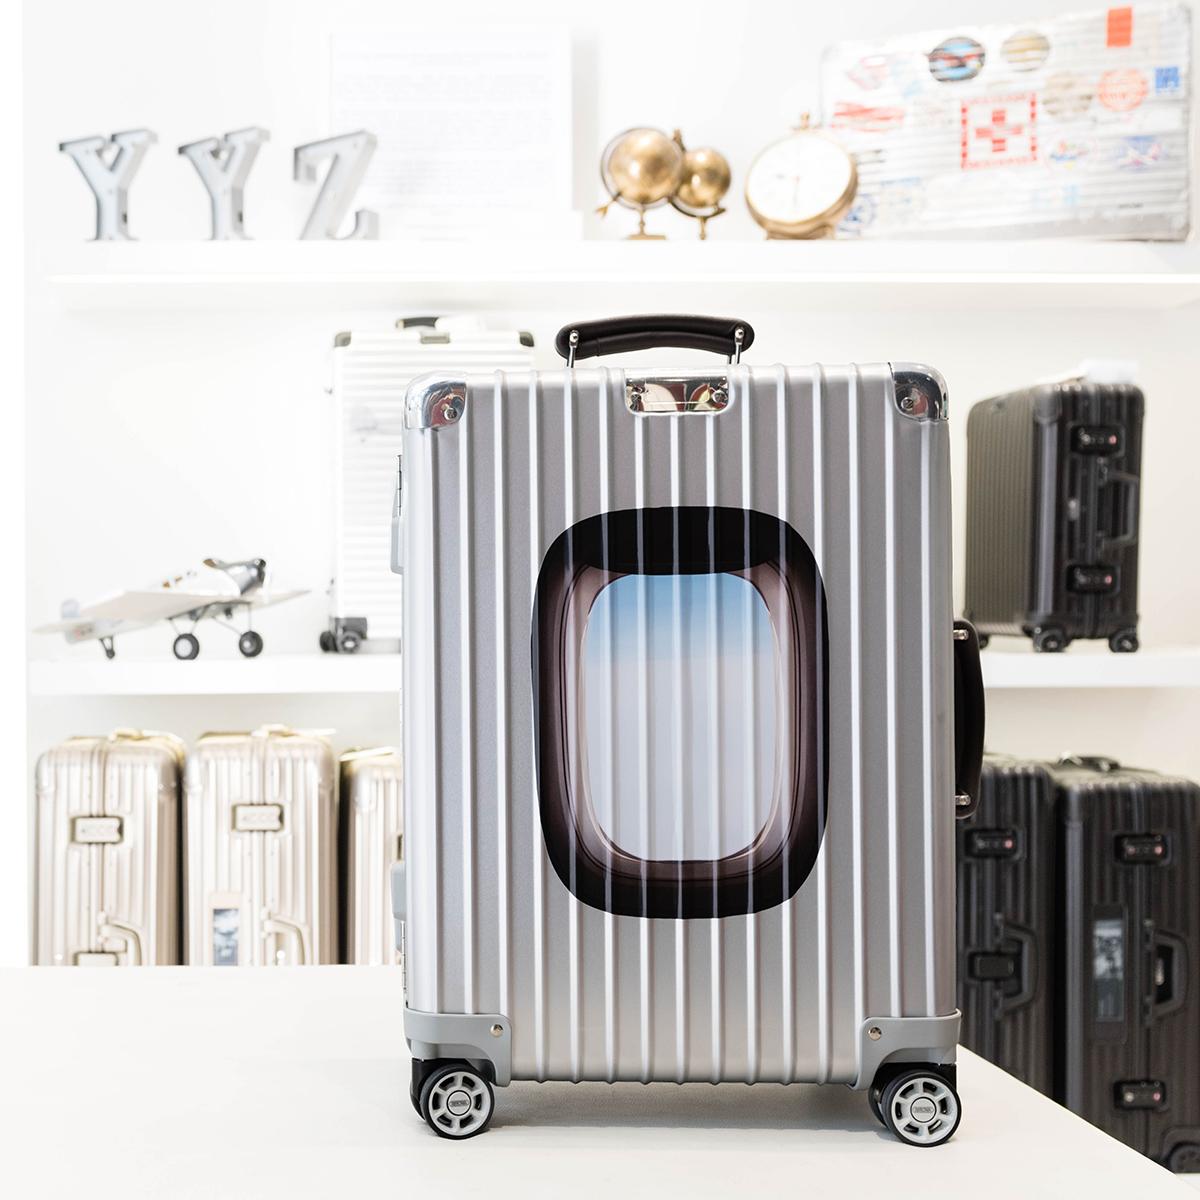 RIMOWA X LAIRD KAY front avgeek luggage 2.jpg